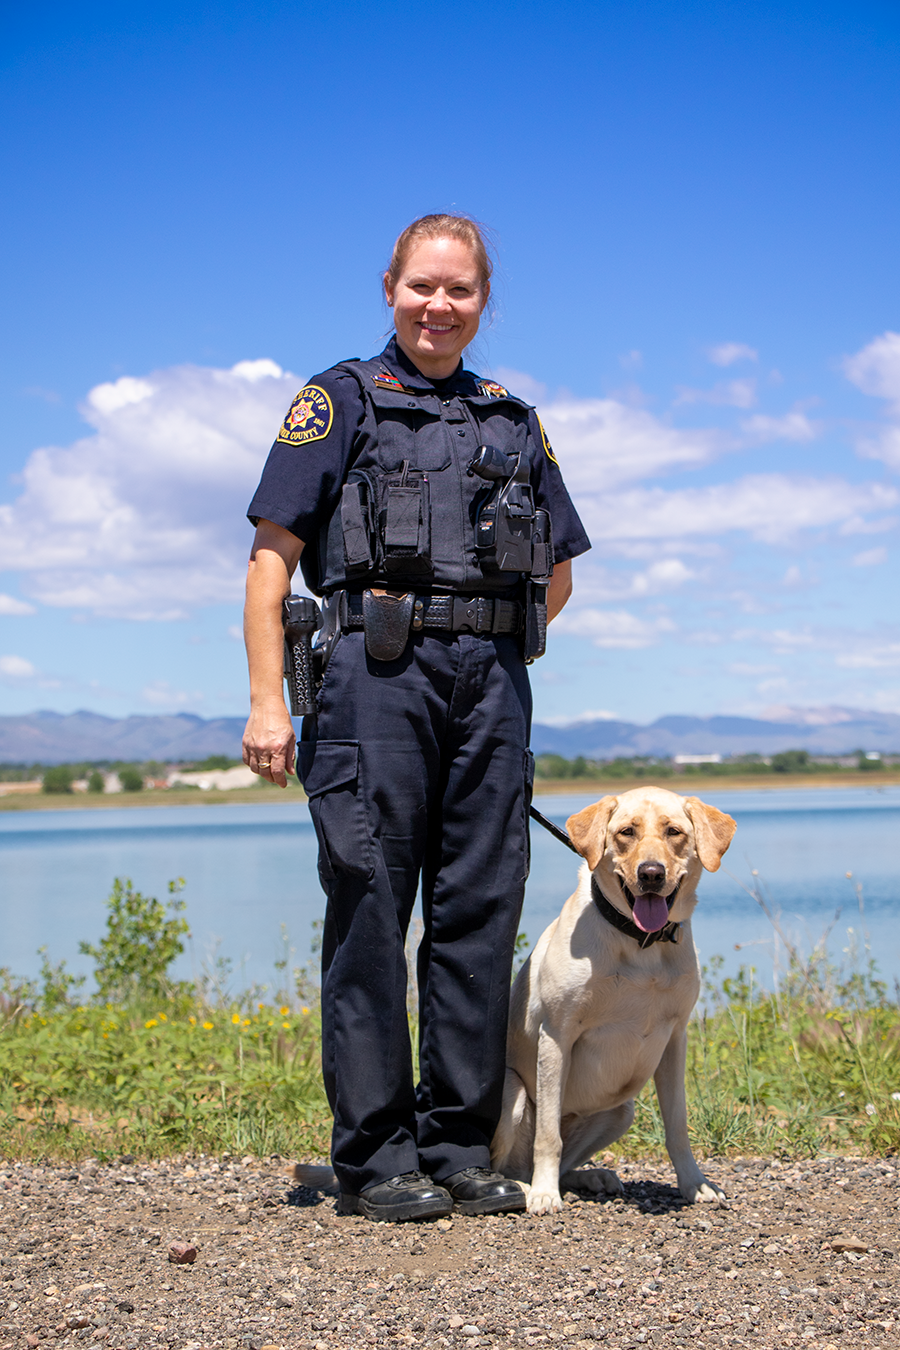 Image 7: Deputy Chriss Hebbeler and K9 Maizey (Yellow Lab)